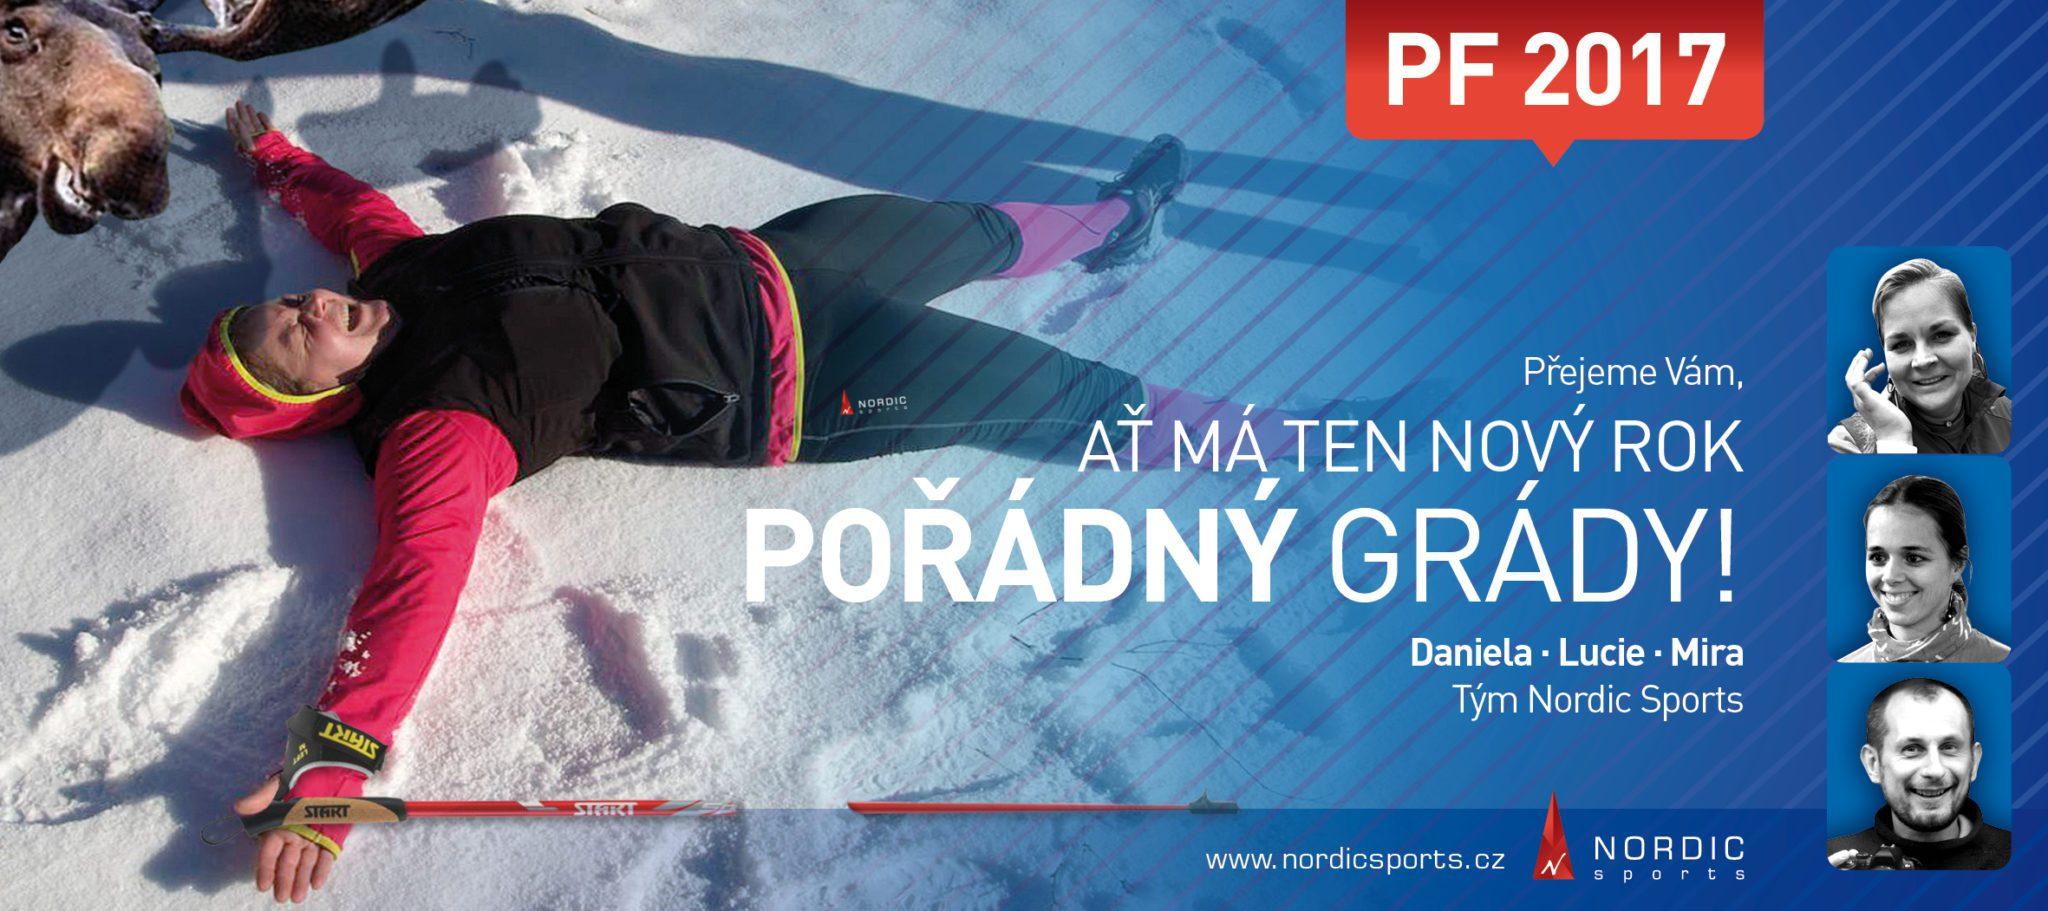 Pf 2017 Nordic sports